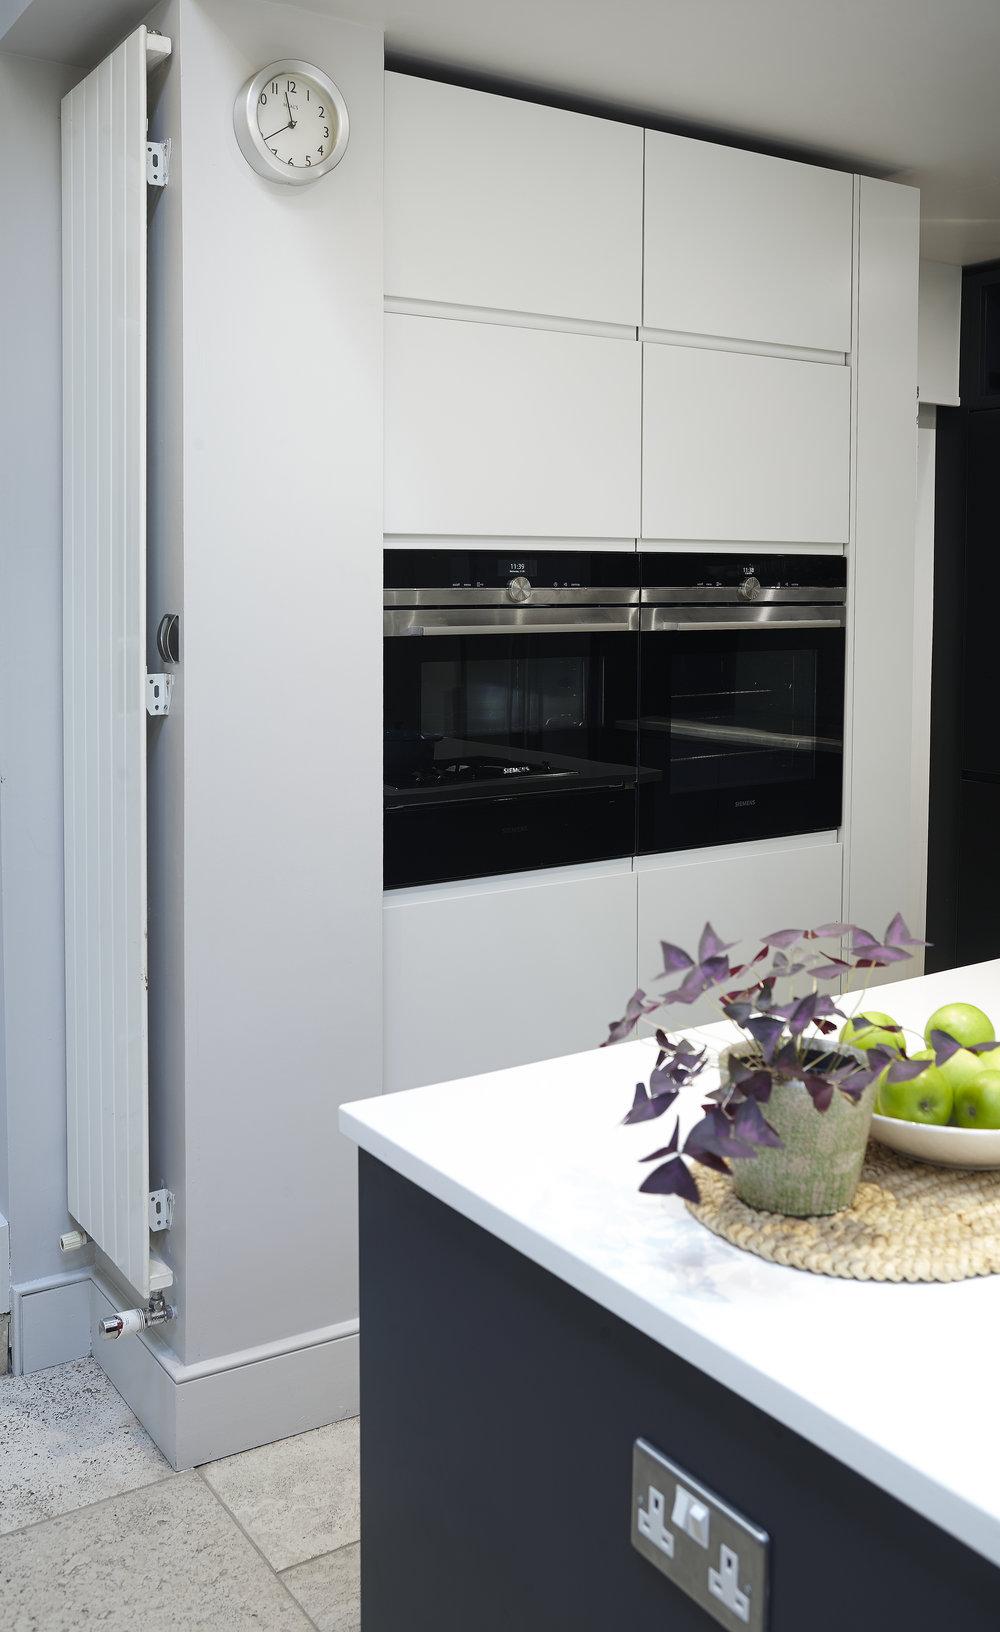 kitchens1127.jpg